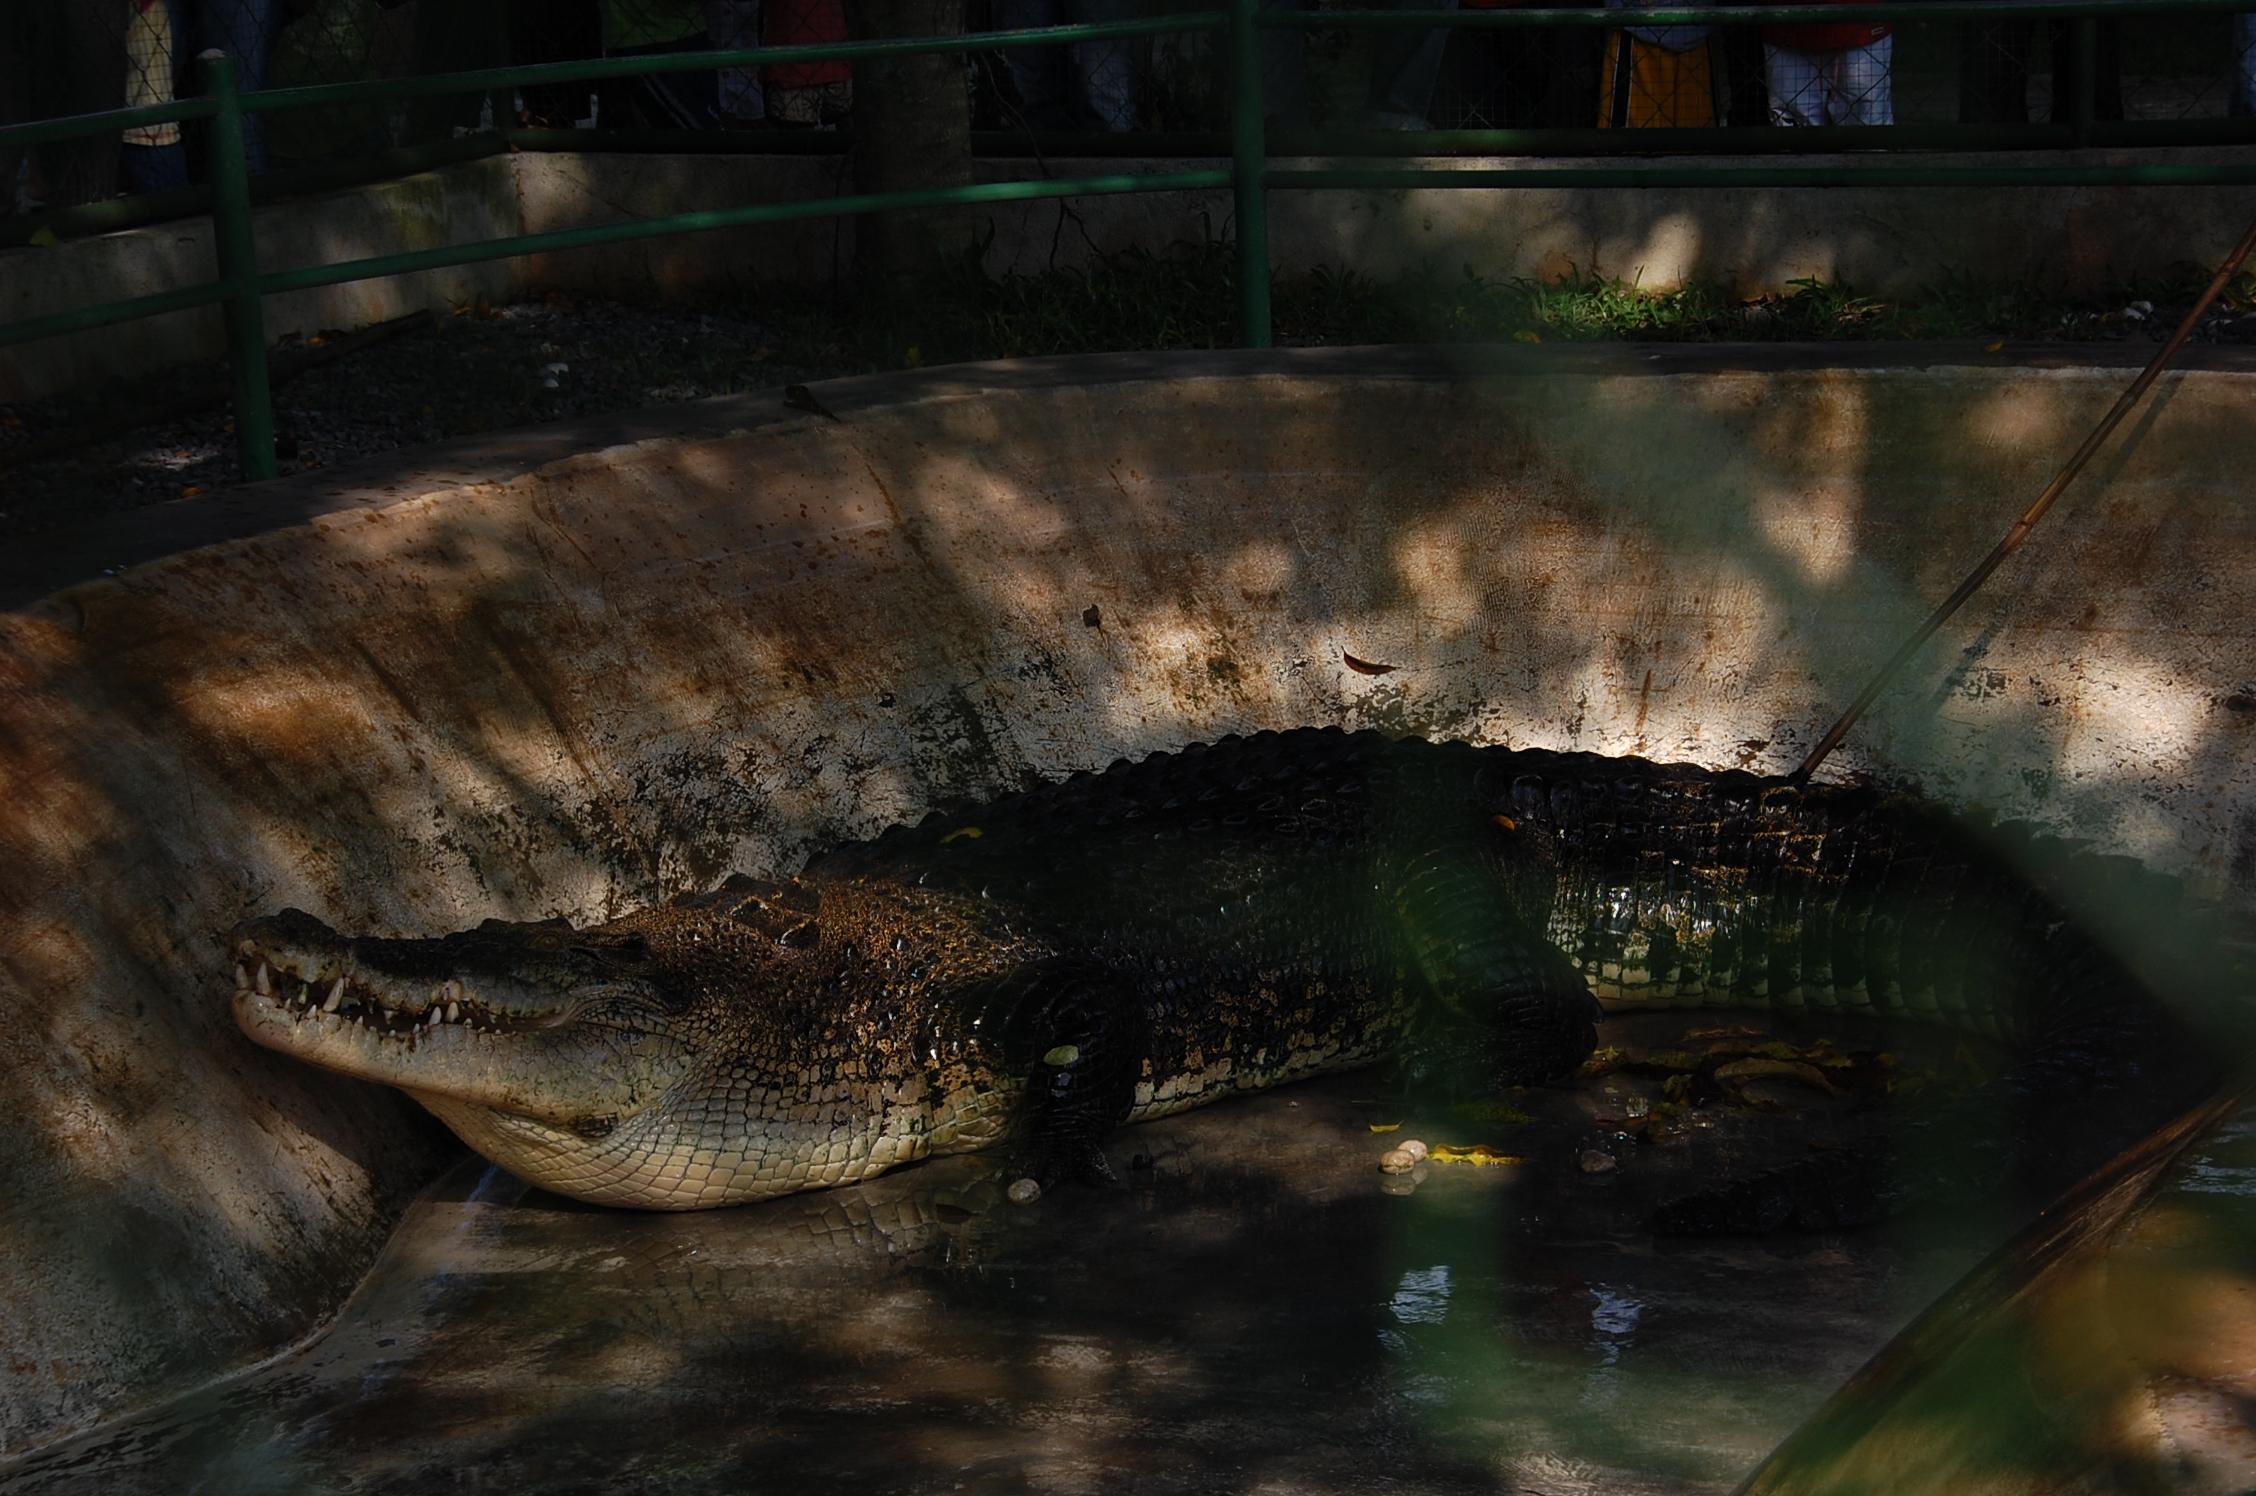 Pangil crocodile